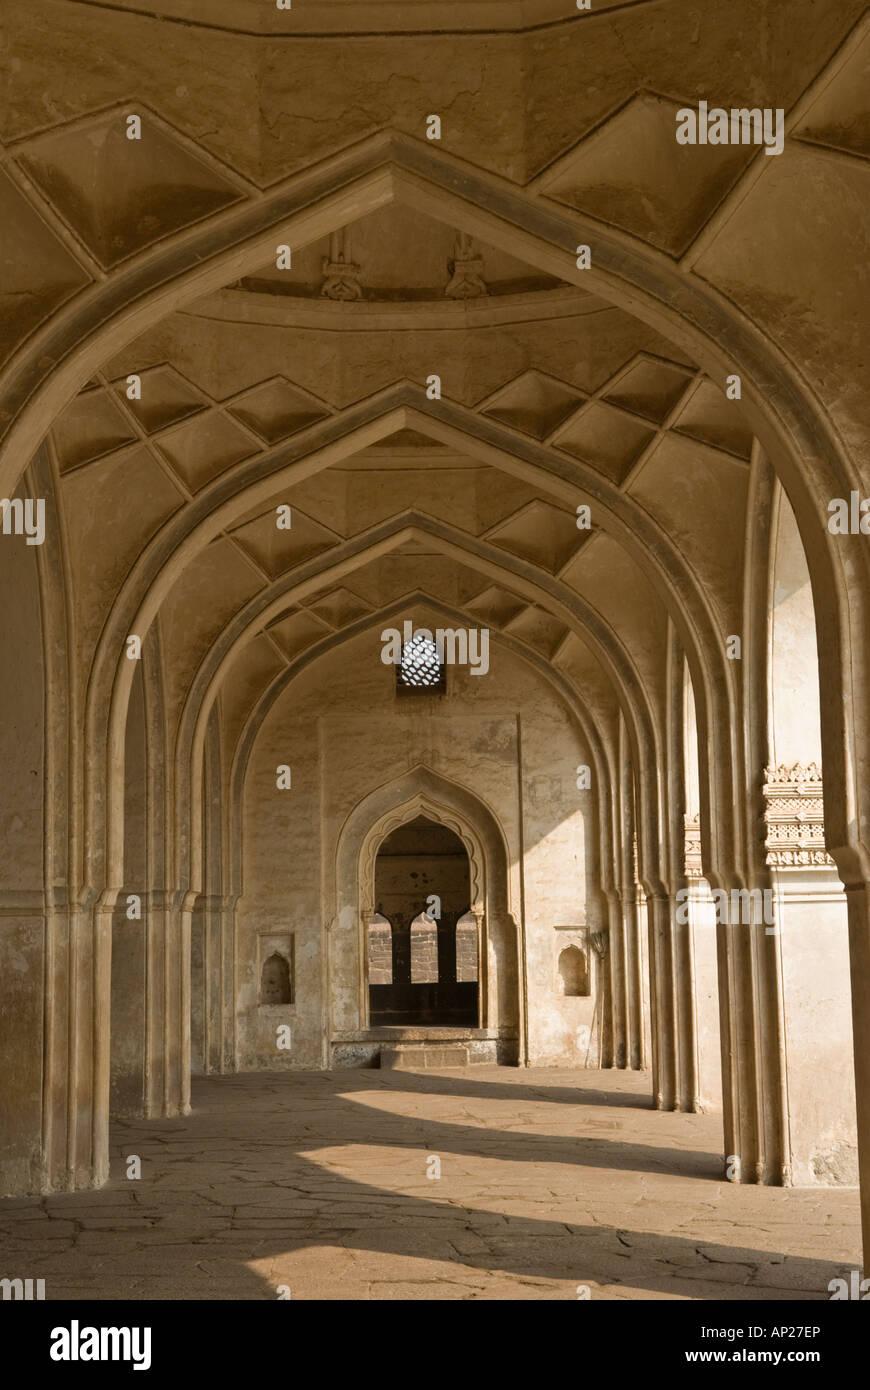 Ibrahim Roza Mausoleum Bijapur Karnataka India Stock Photo